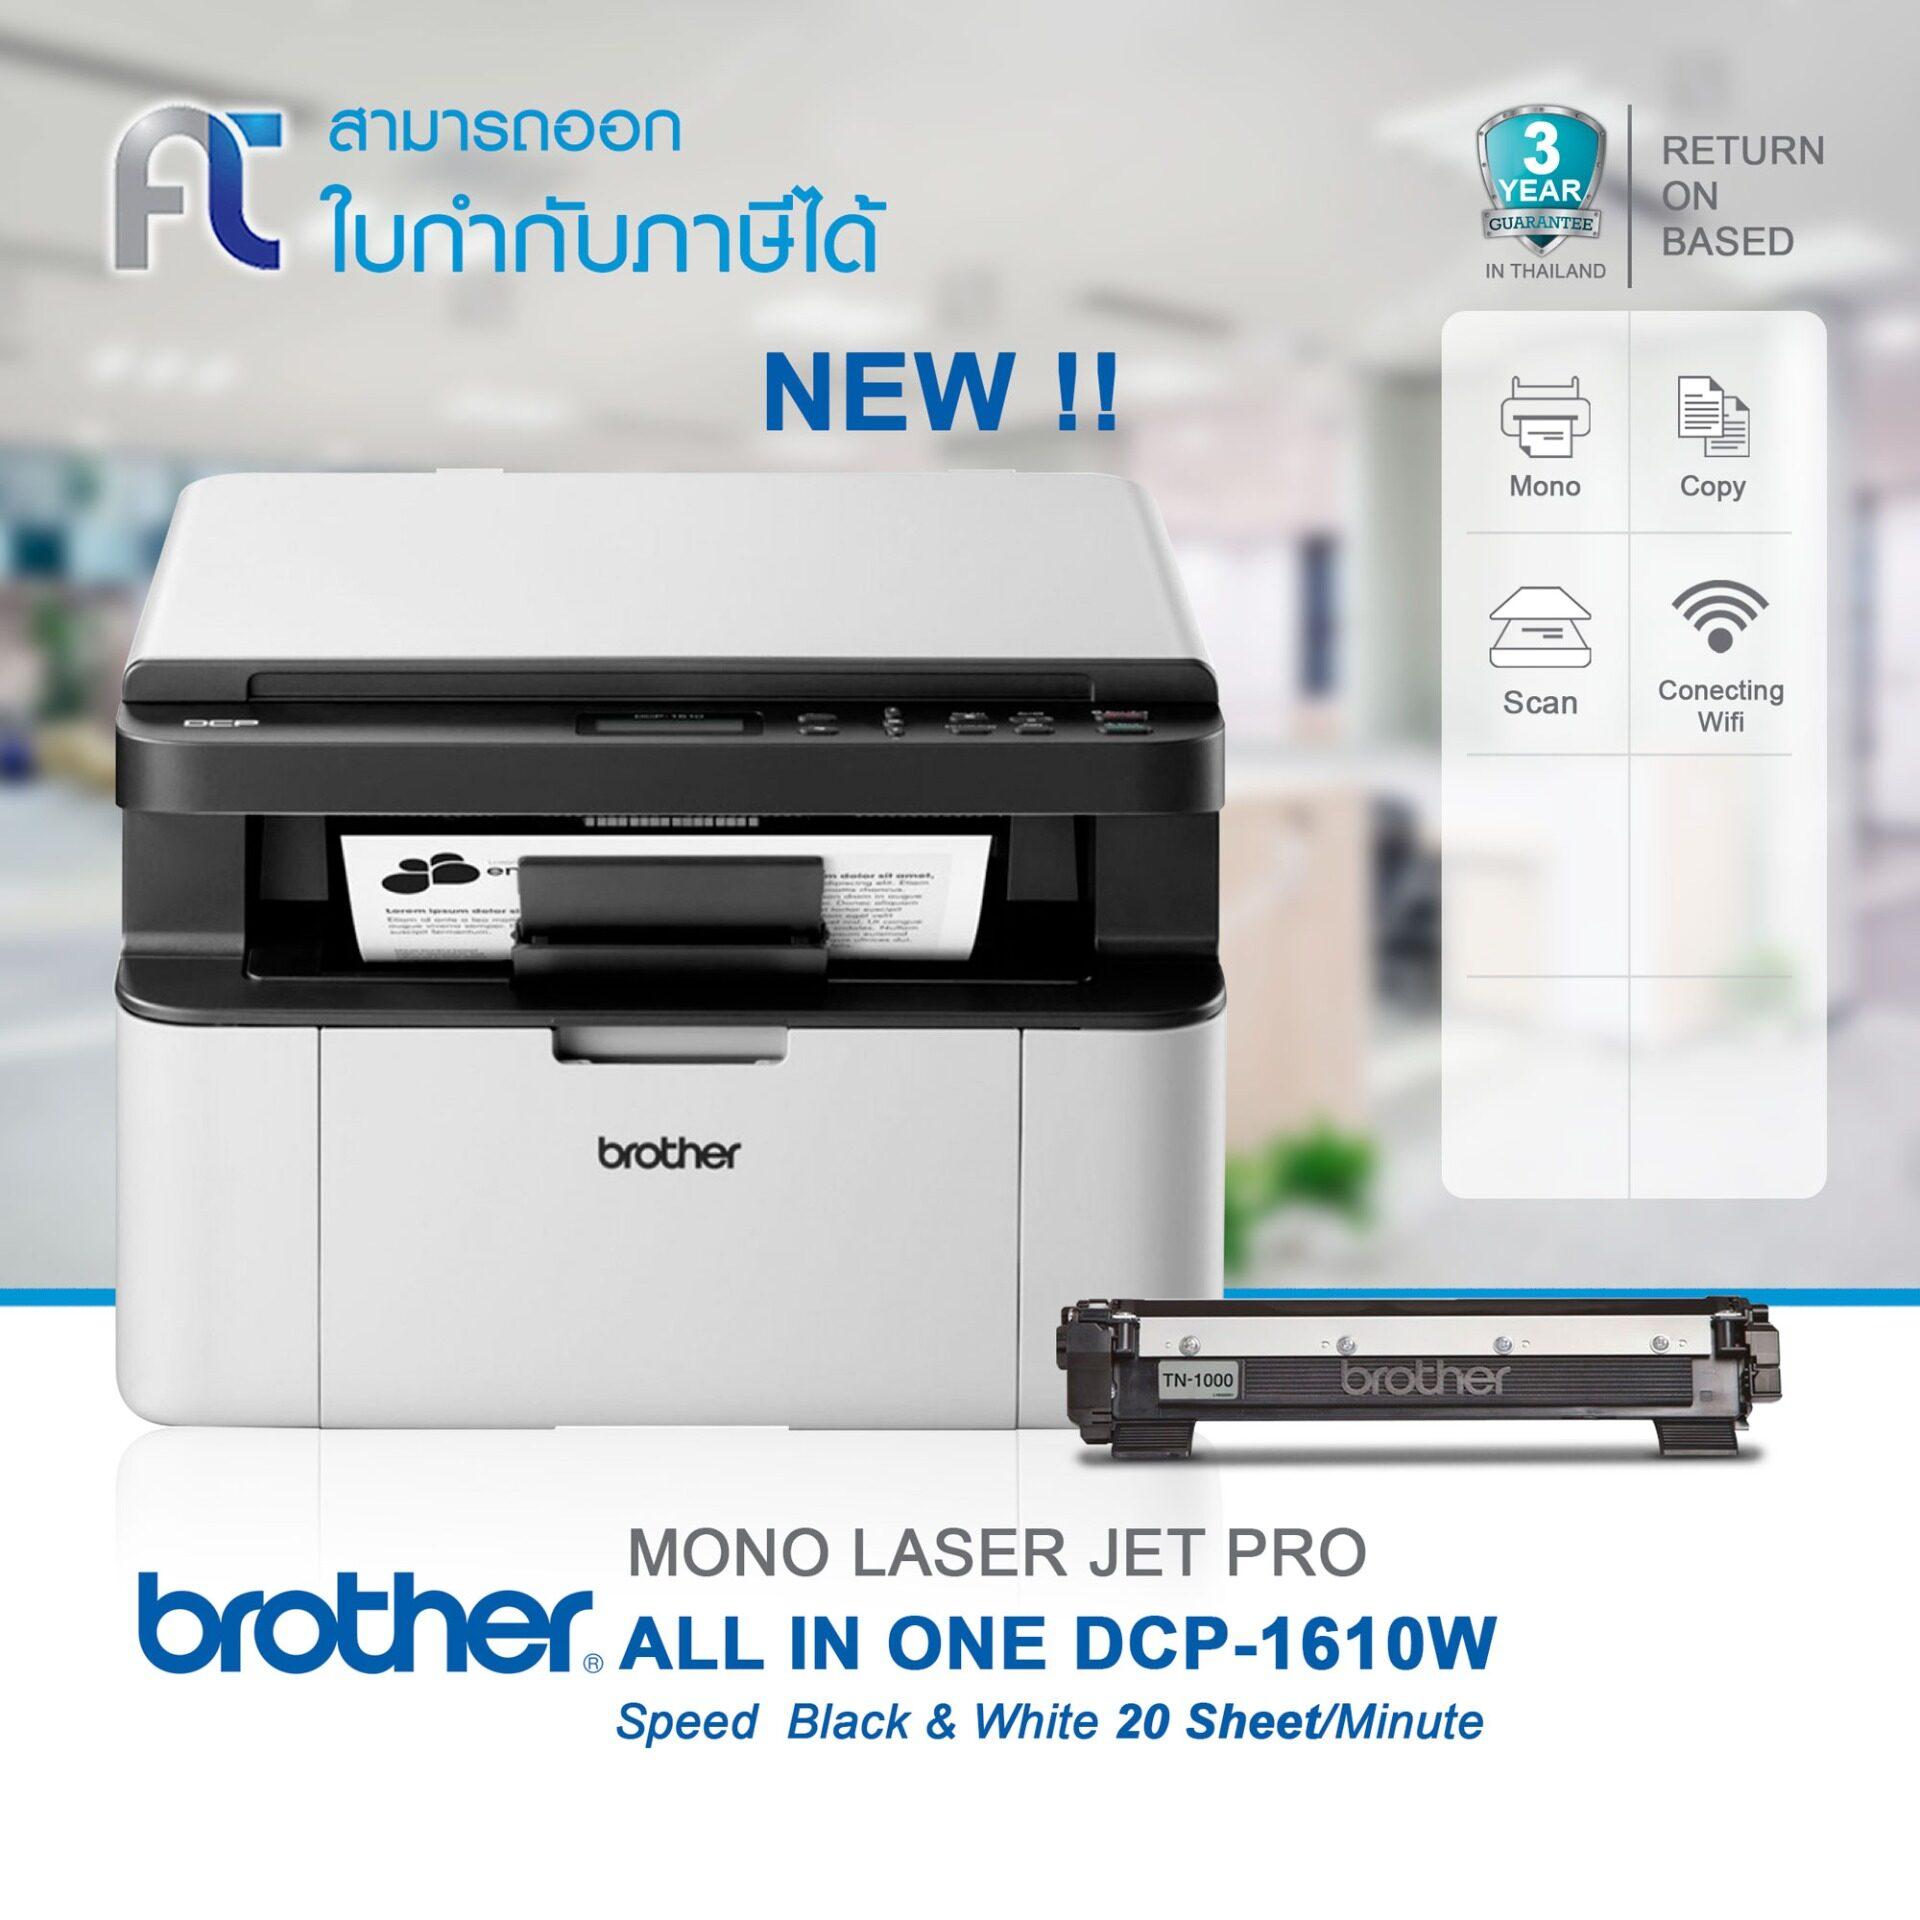 Printer (เครื่องพิมพ์ไร้สาย) Brother Dcp-1610w Laser All-In-One.